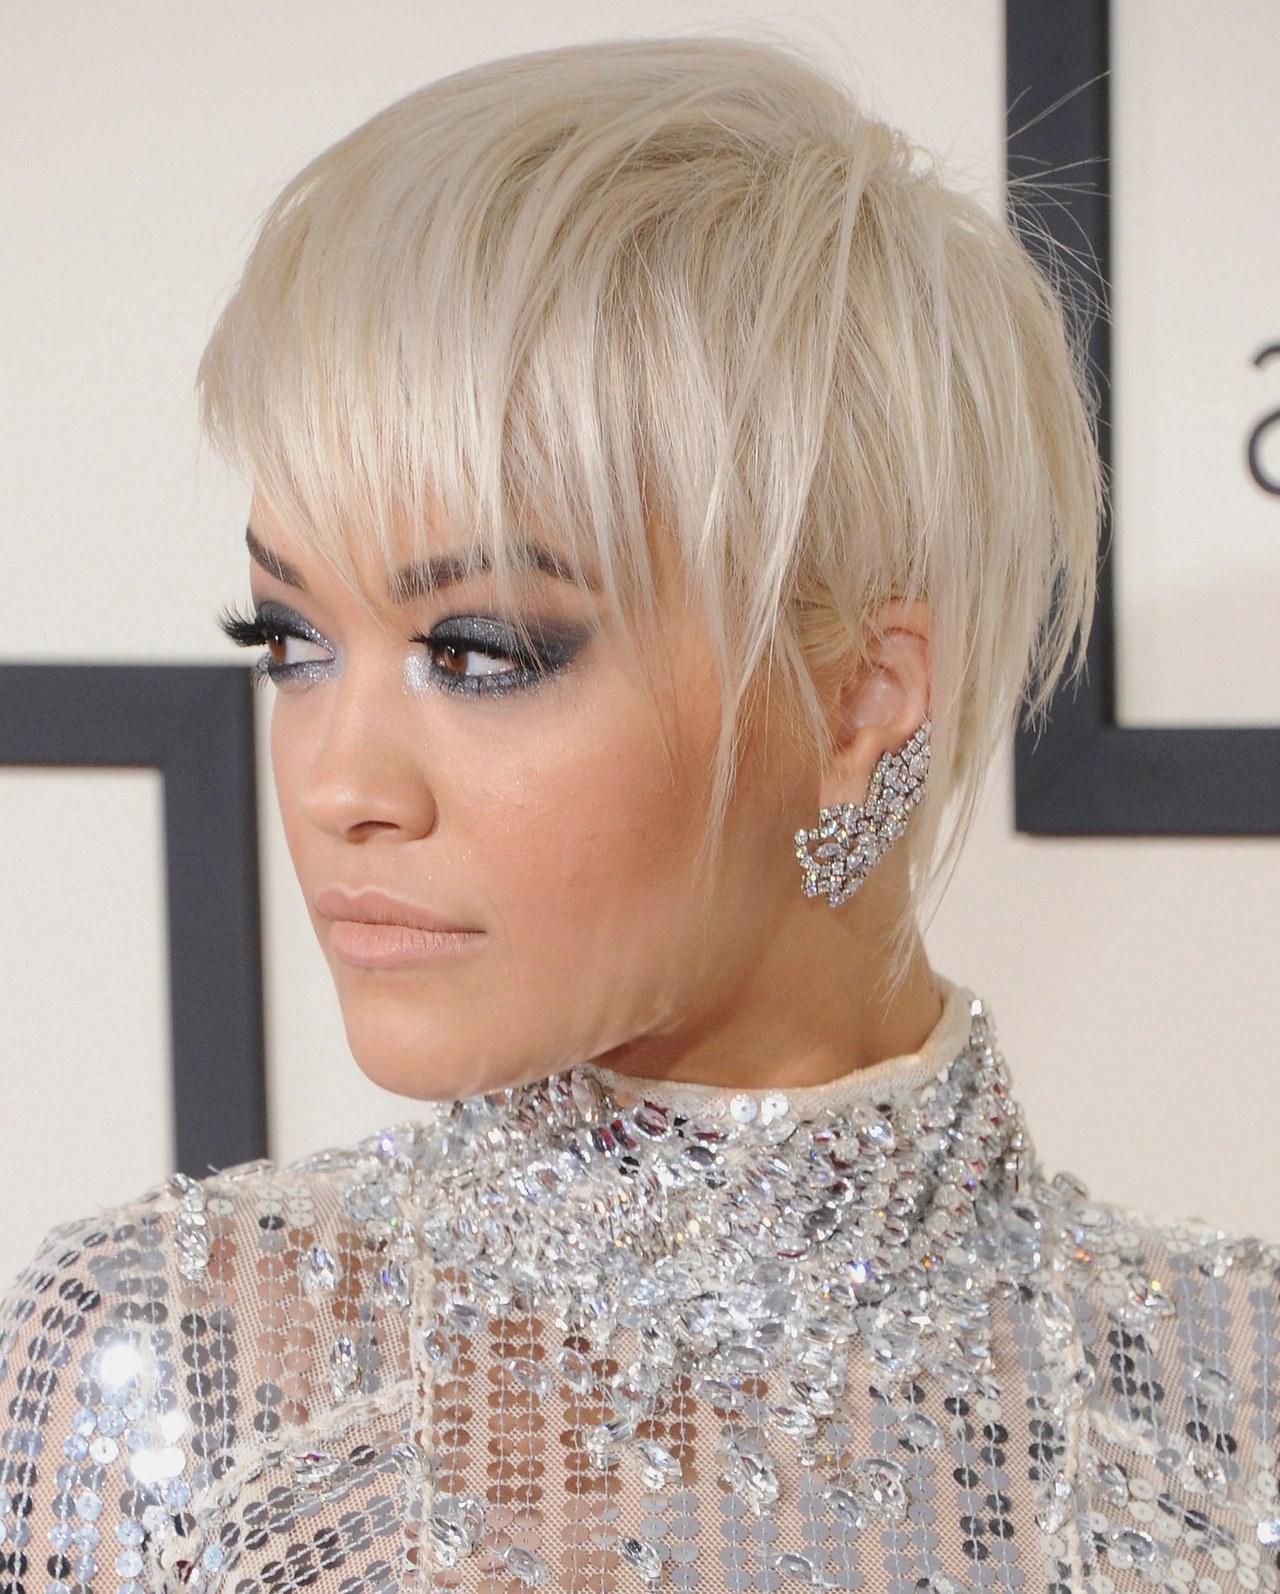 5 Fantastic Short Haircuts That Aren't Bobs On Rita Ora, Zendaya Intended For Rita Ora Short Hairstyles (View 9 of 25)